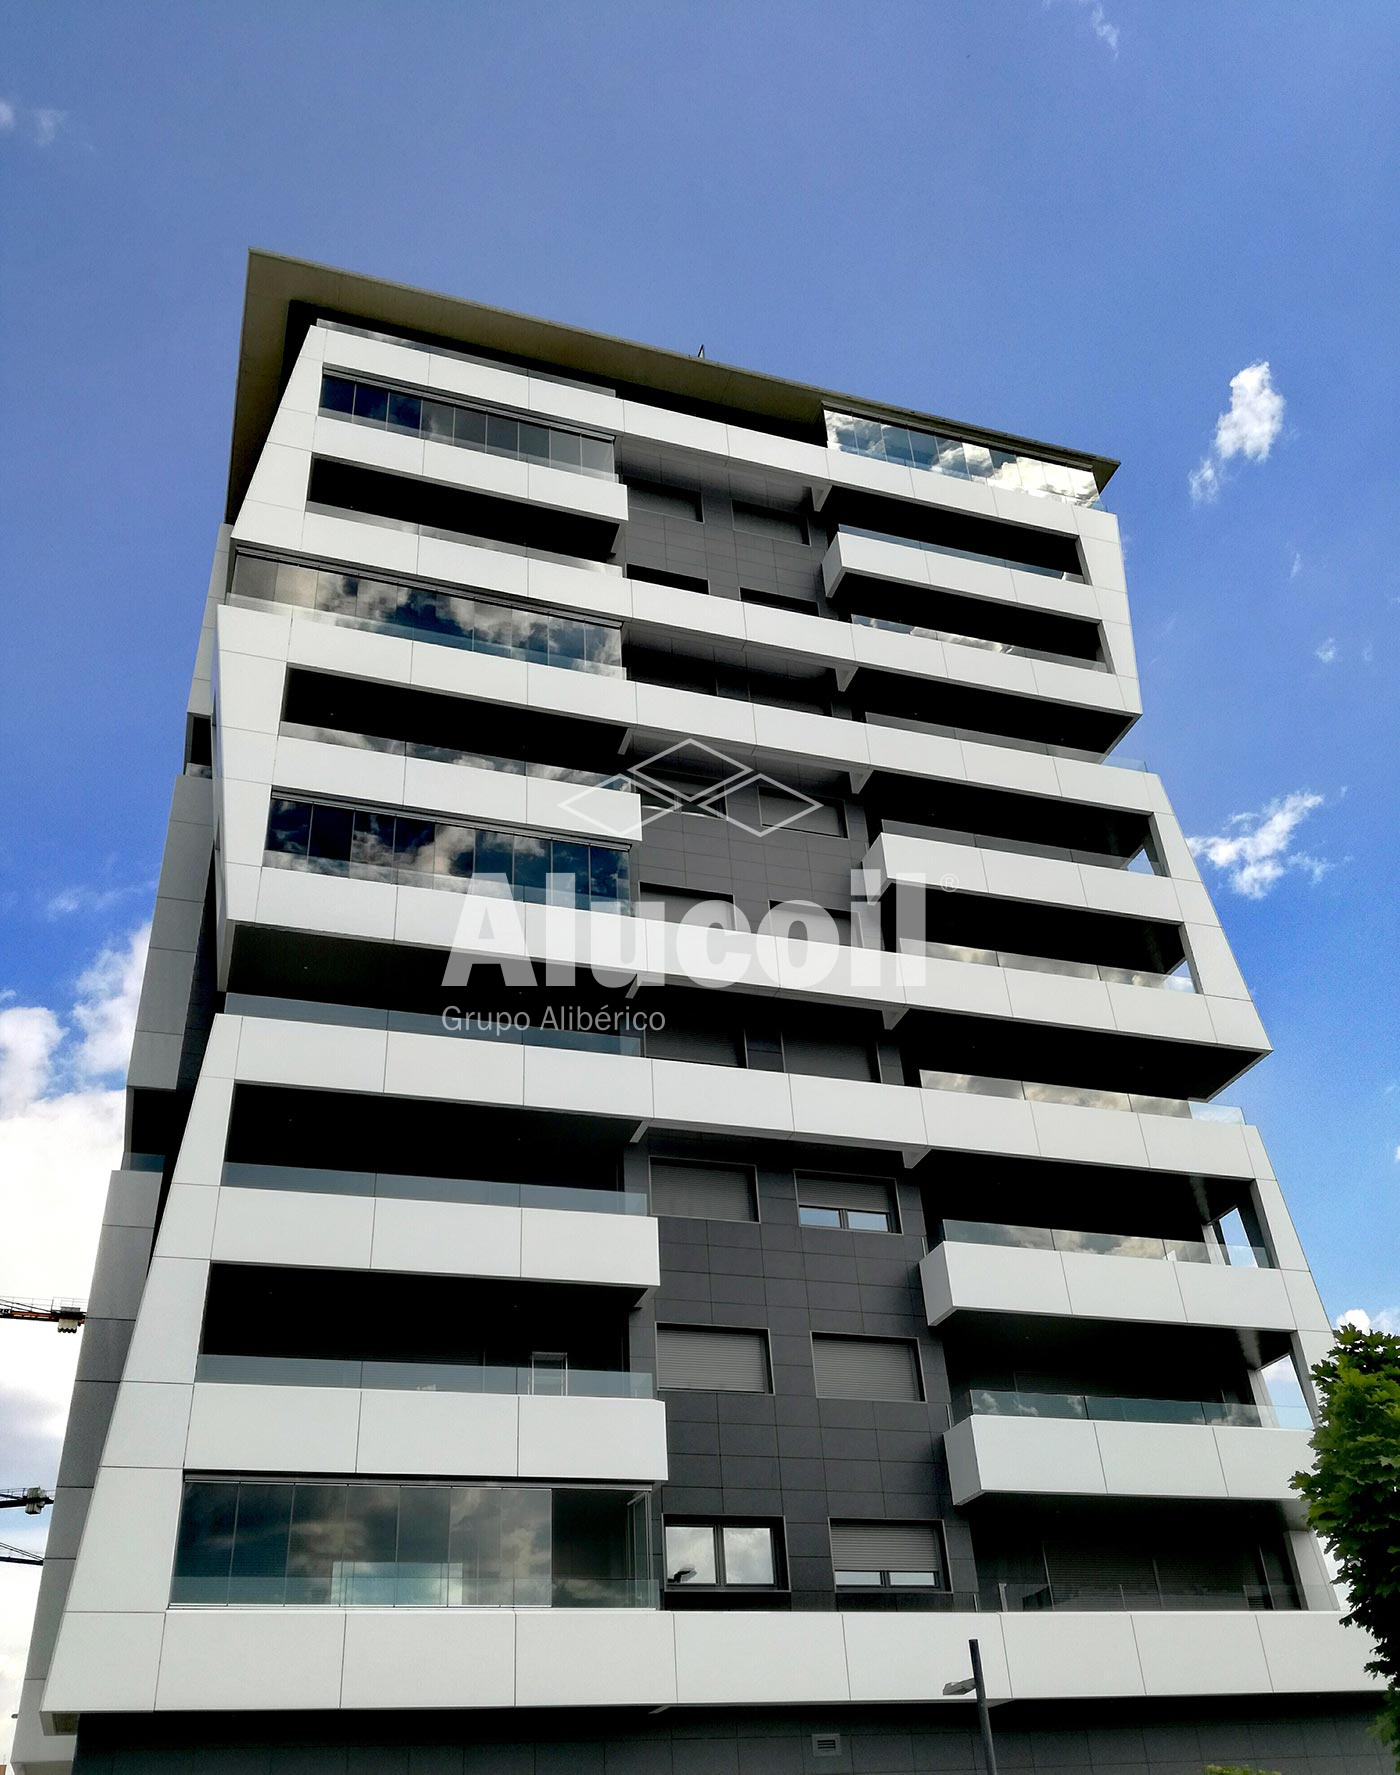 Housing Building Lezkairu